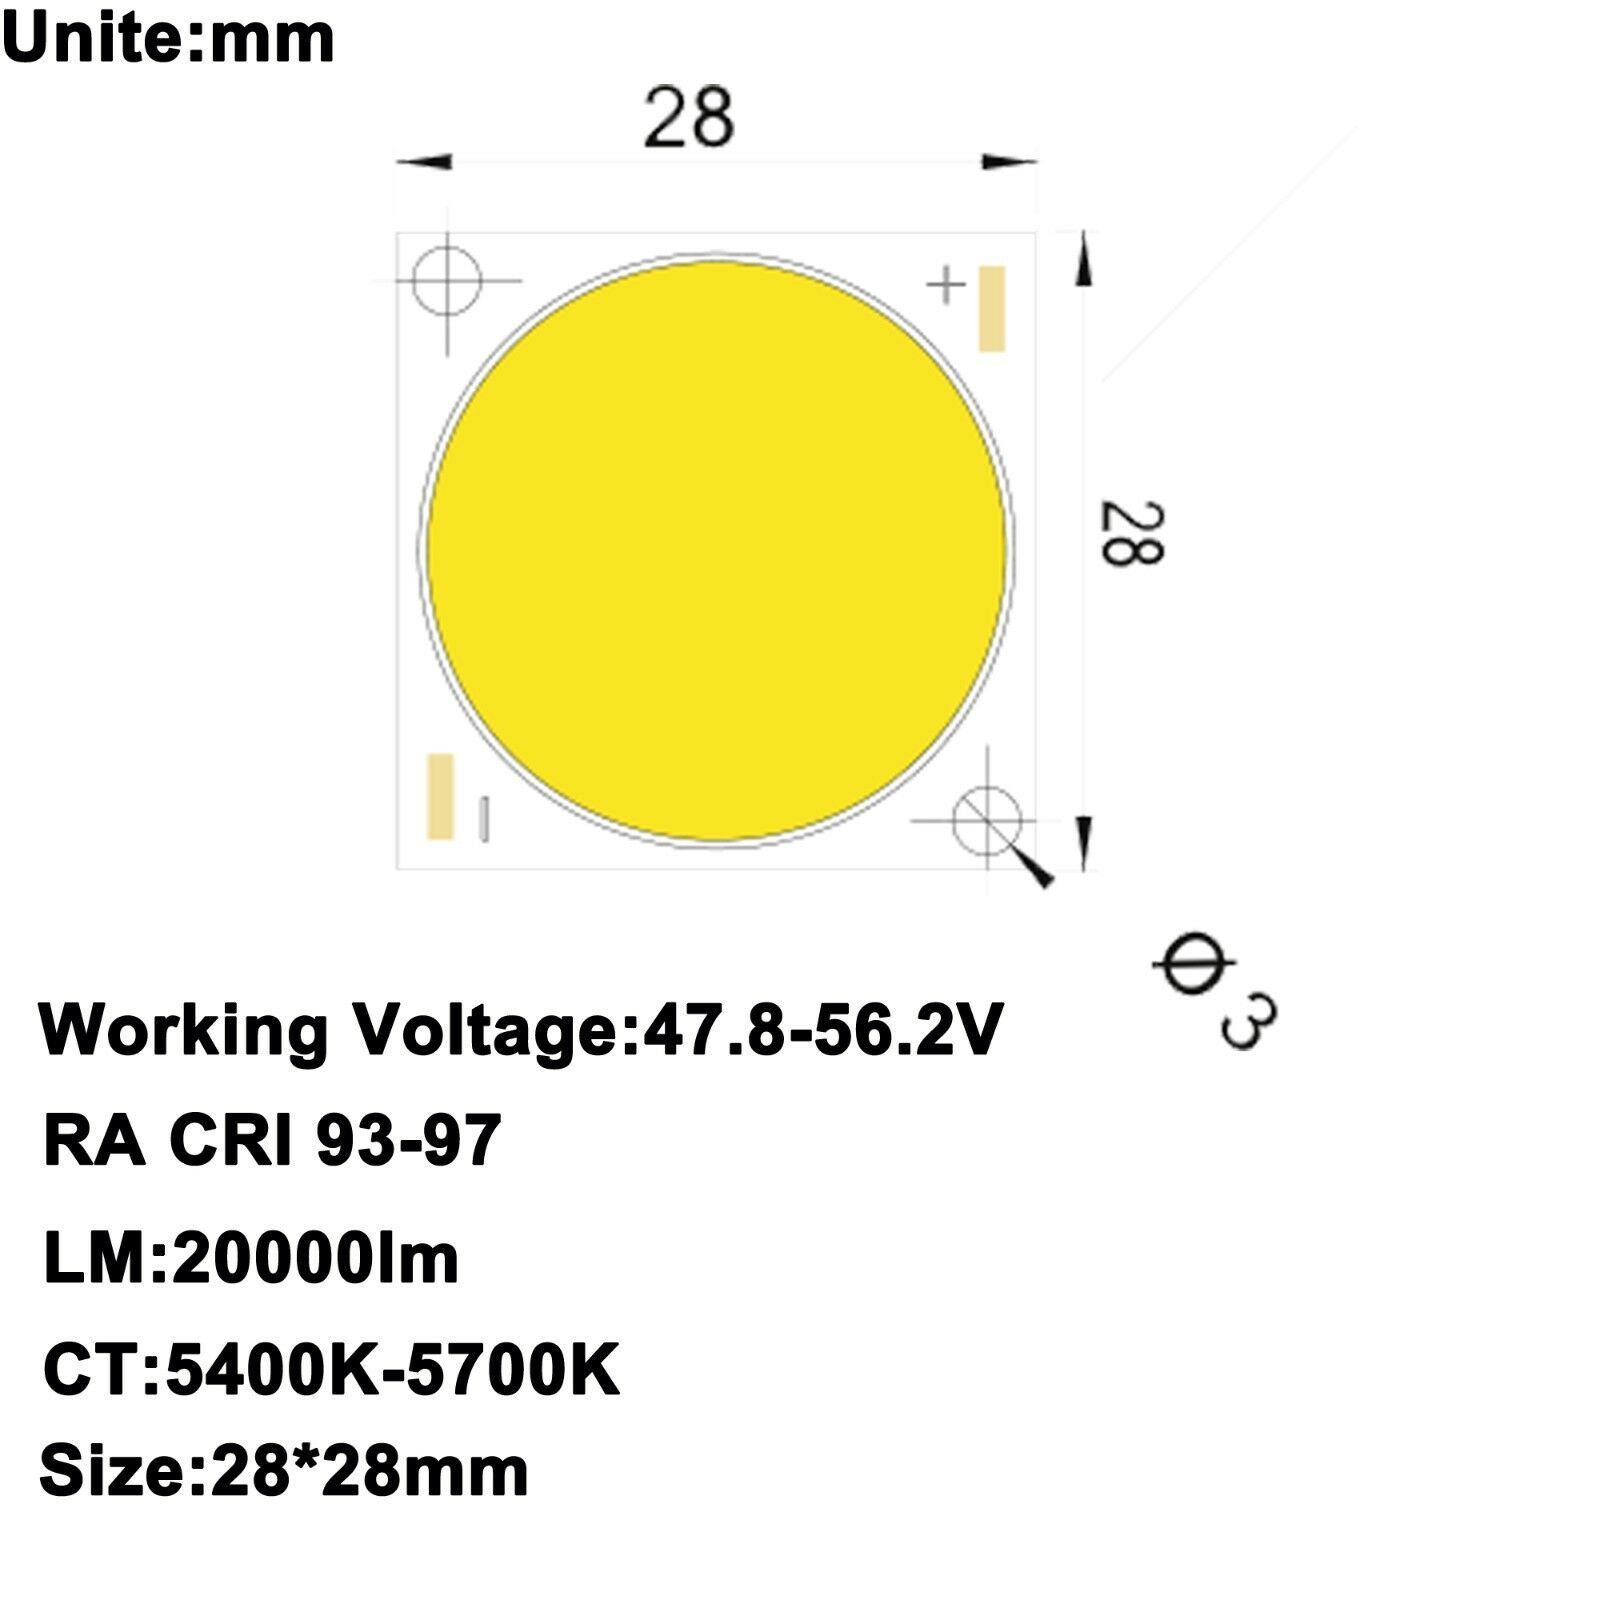 High CRI 95+ ra (93-97) COB LED Luz blancoo 5600K 56 V 3.5 A 200 W 20000 LM